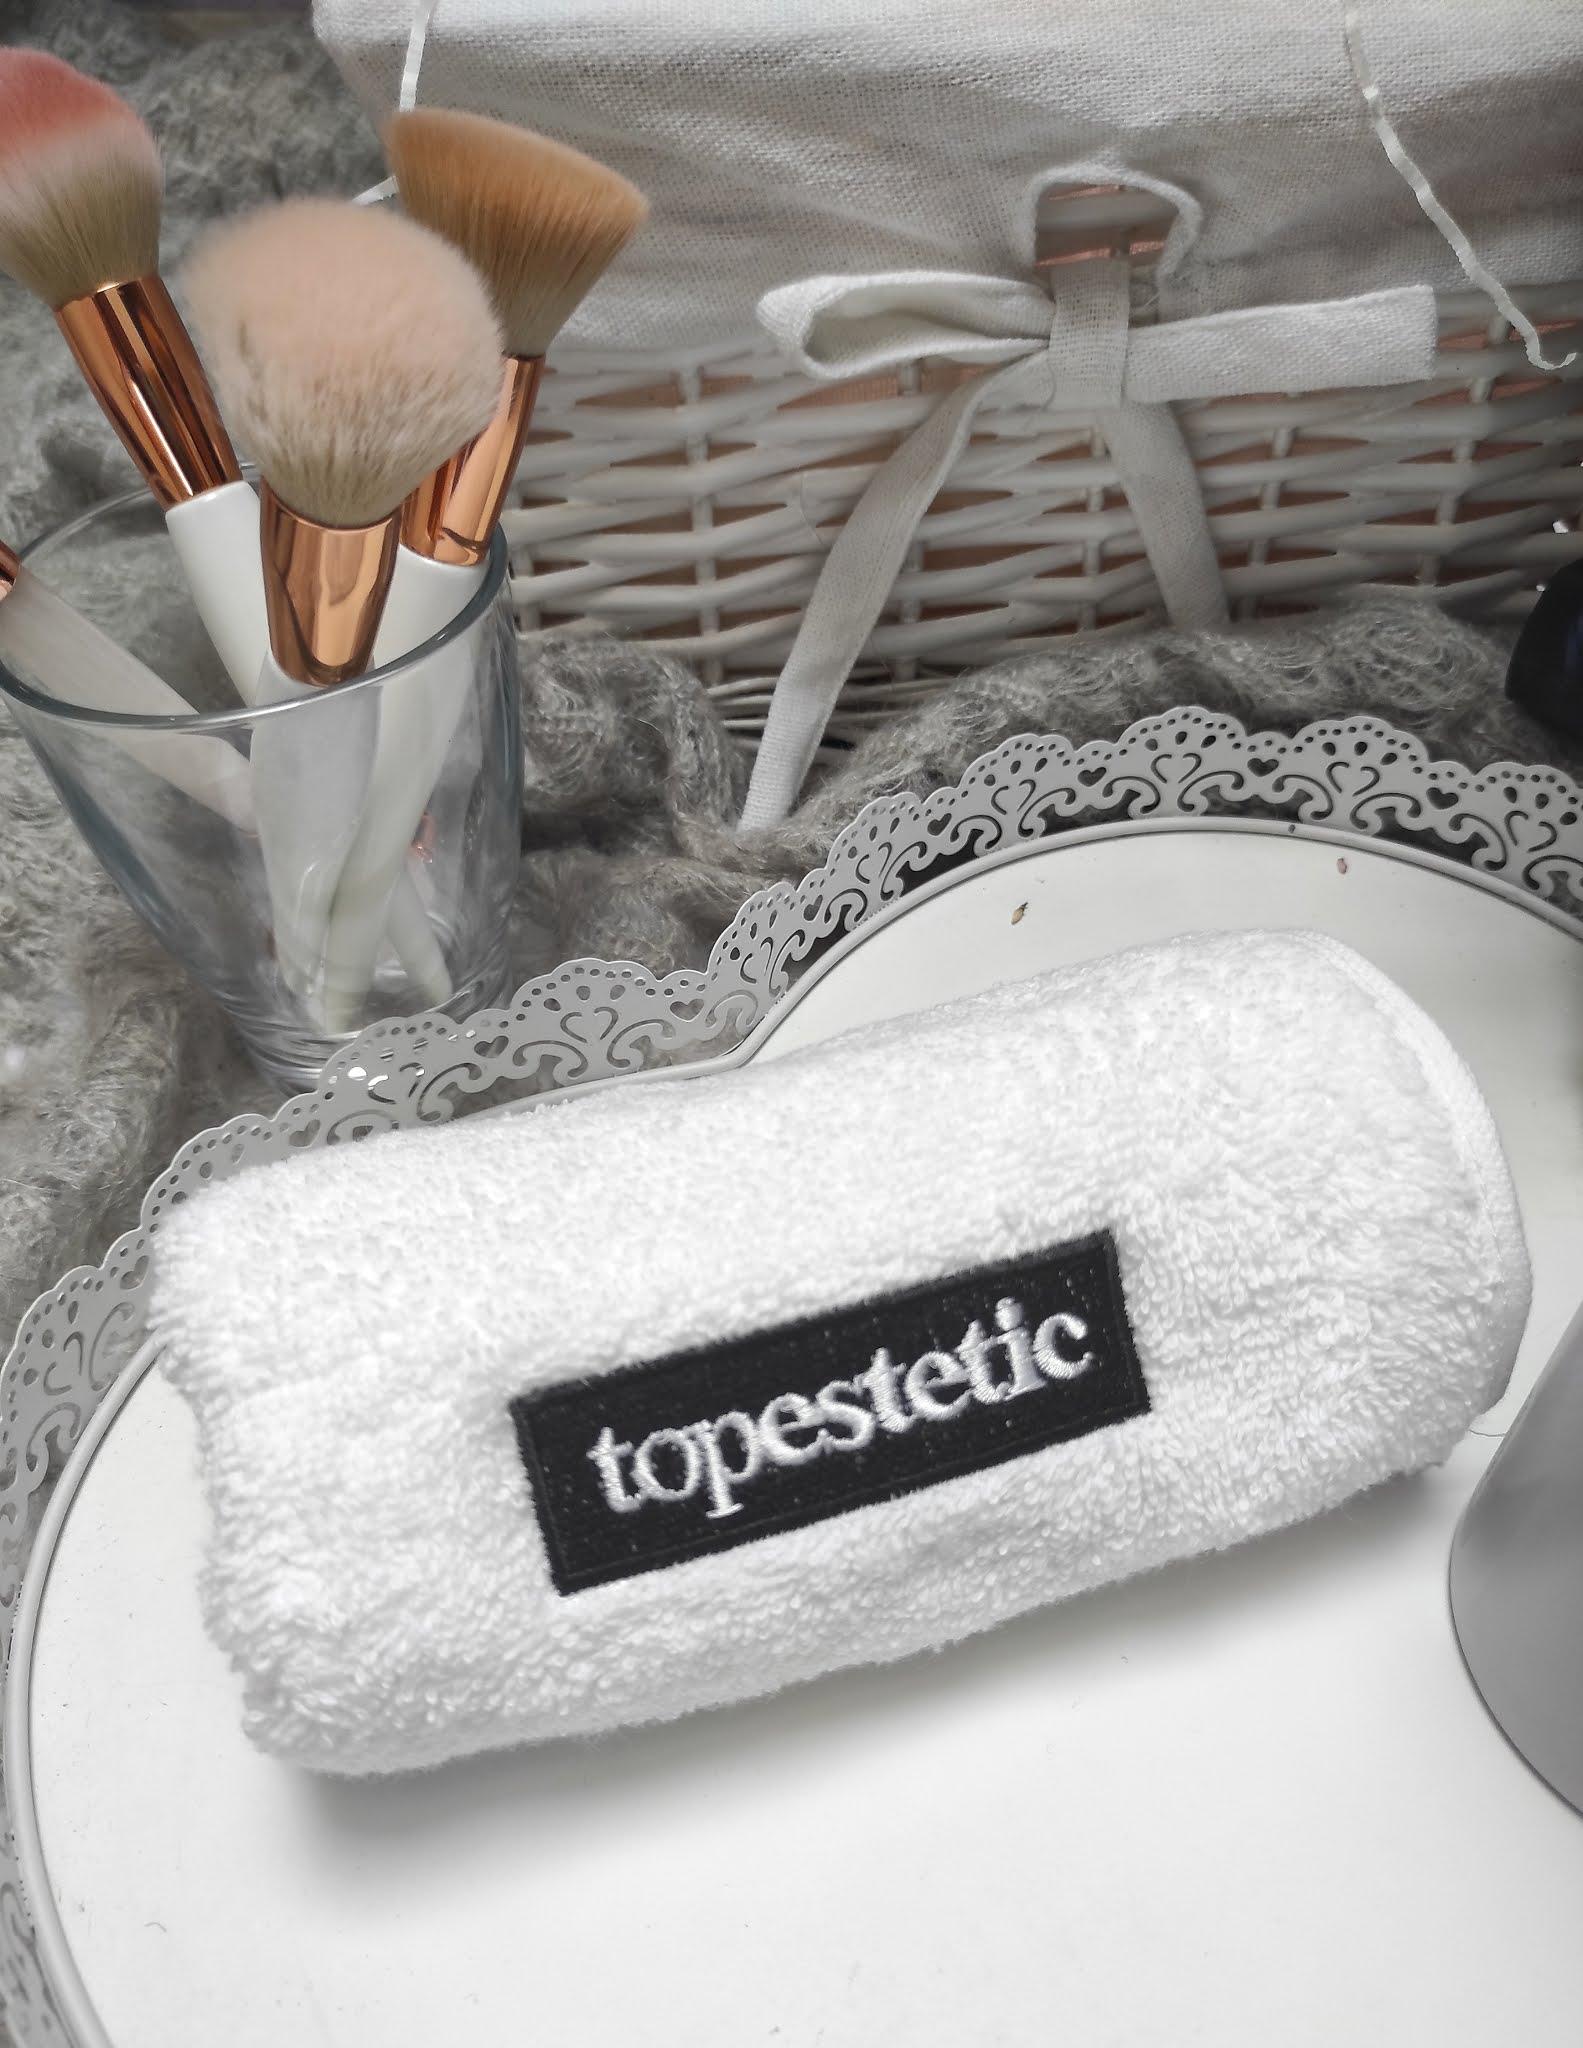 Topestetic